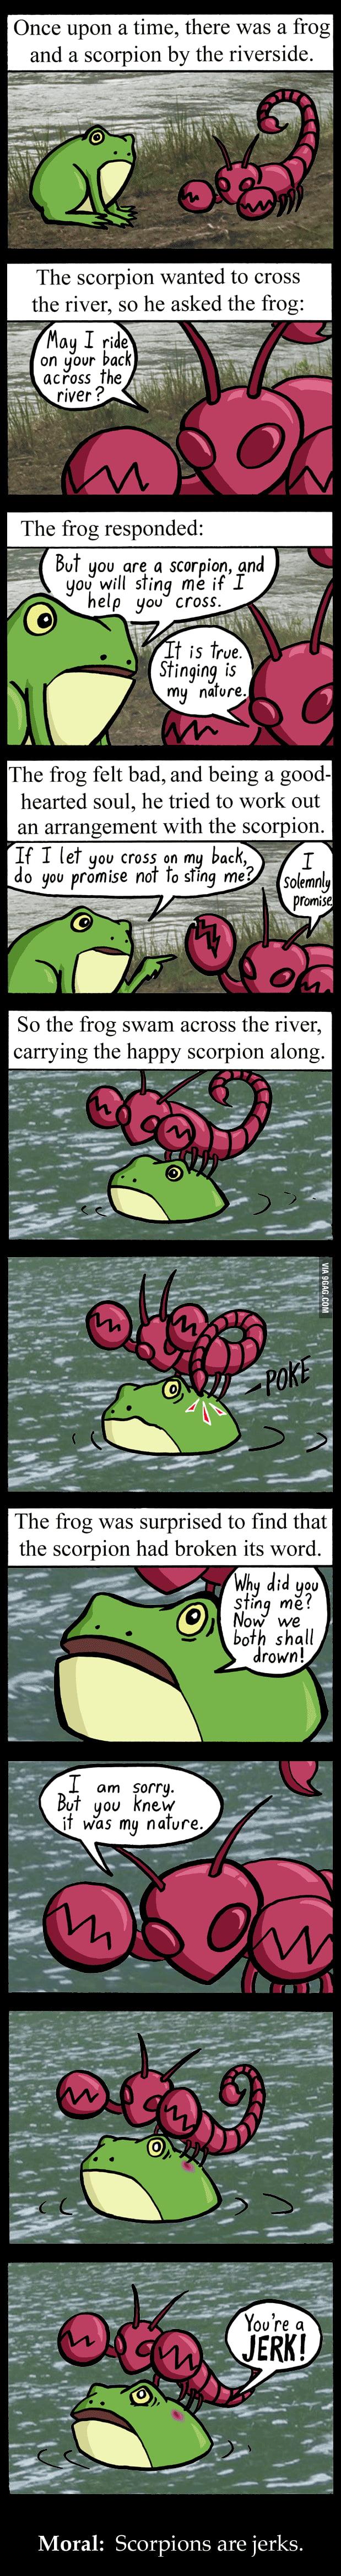 Scorpions are jerks